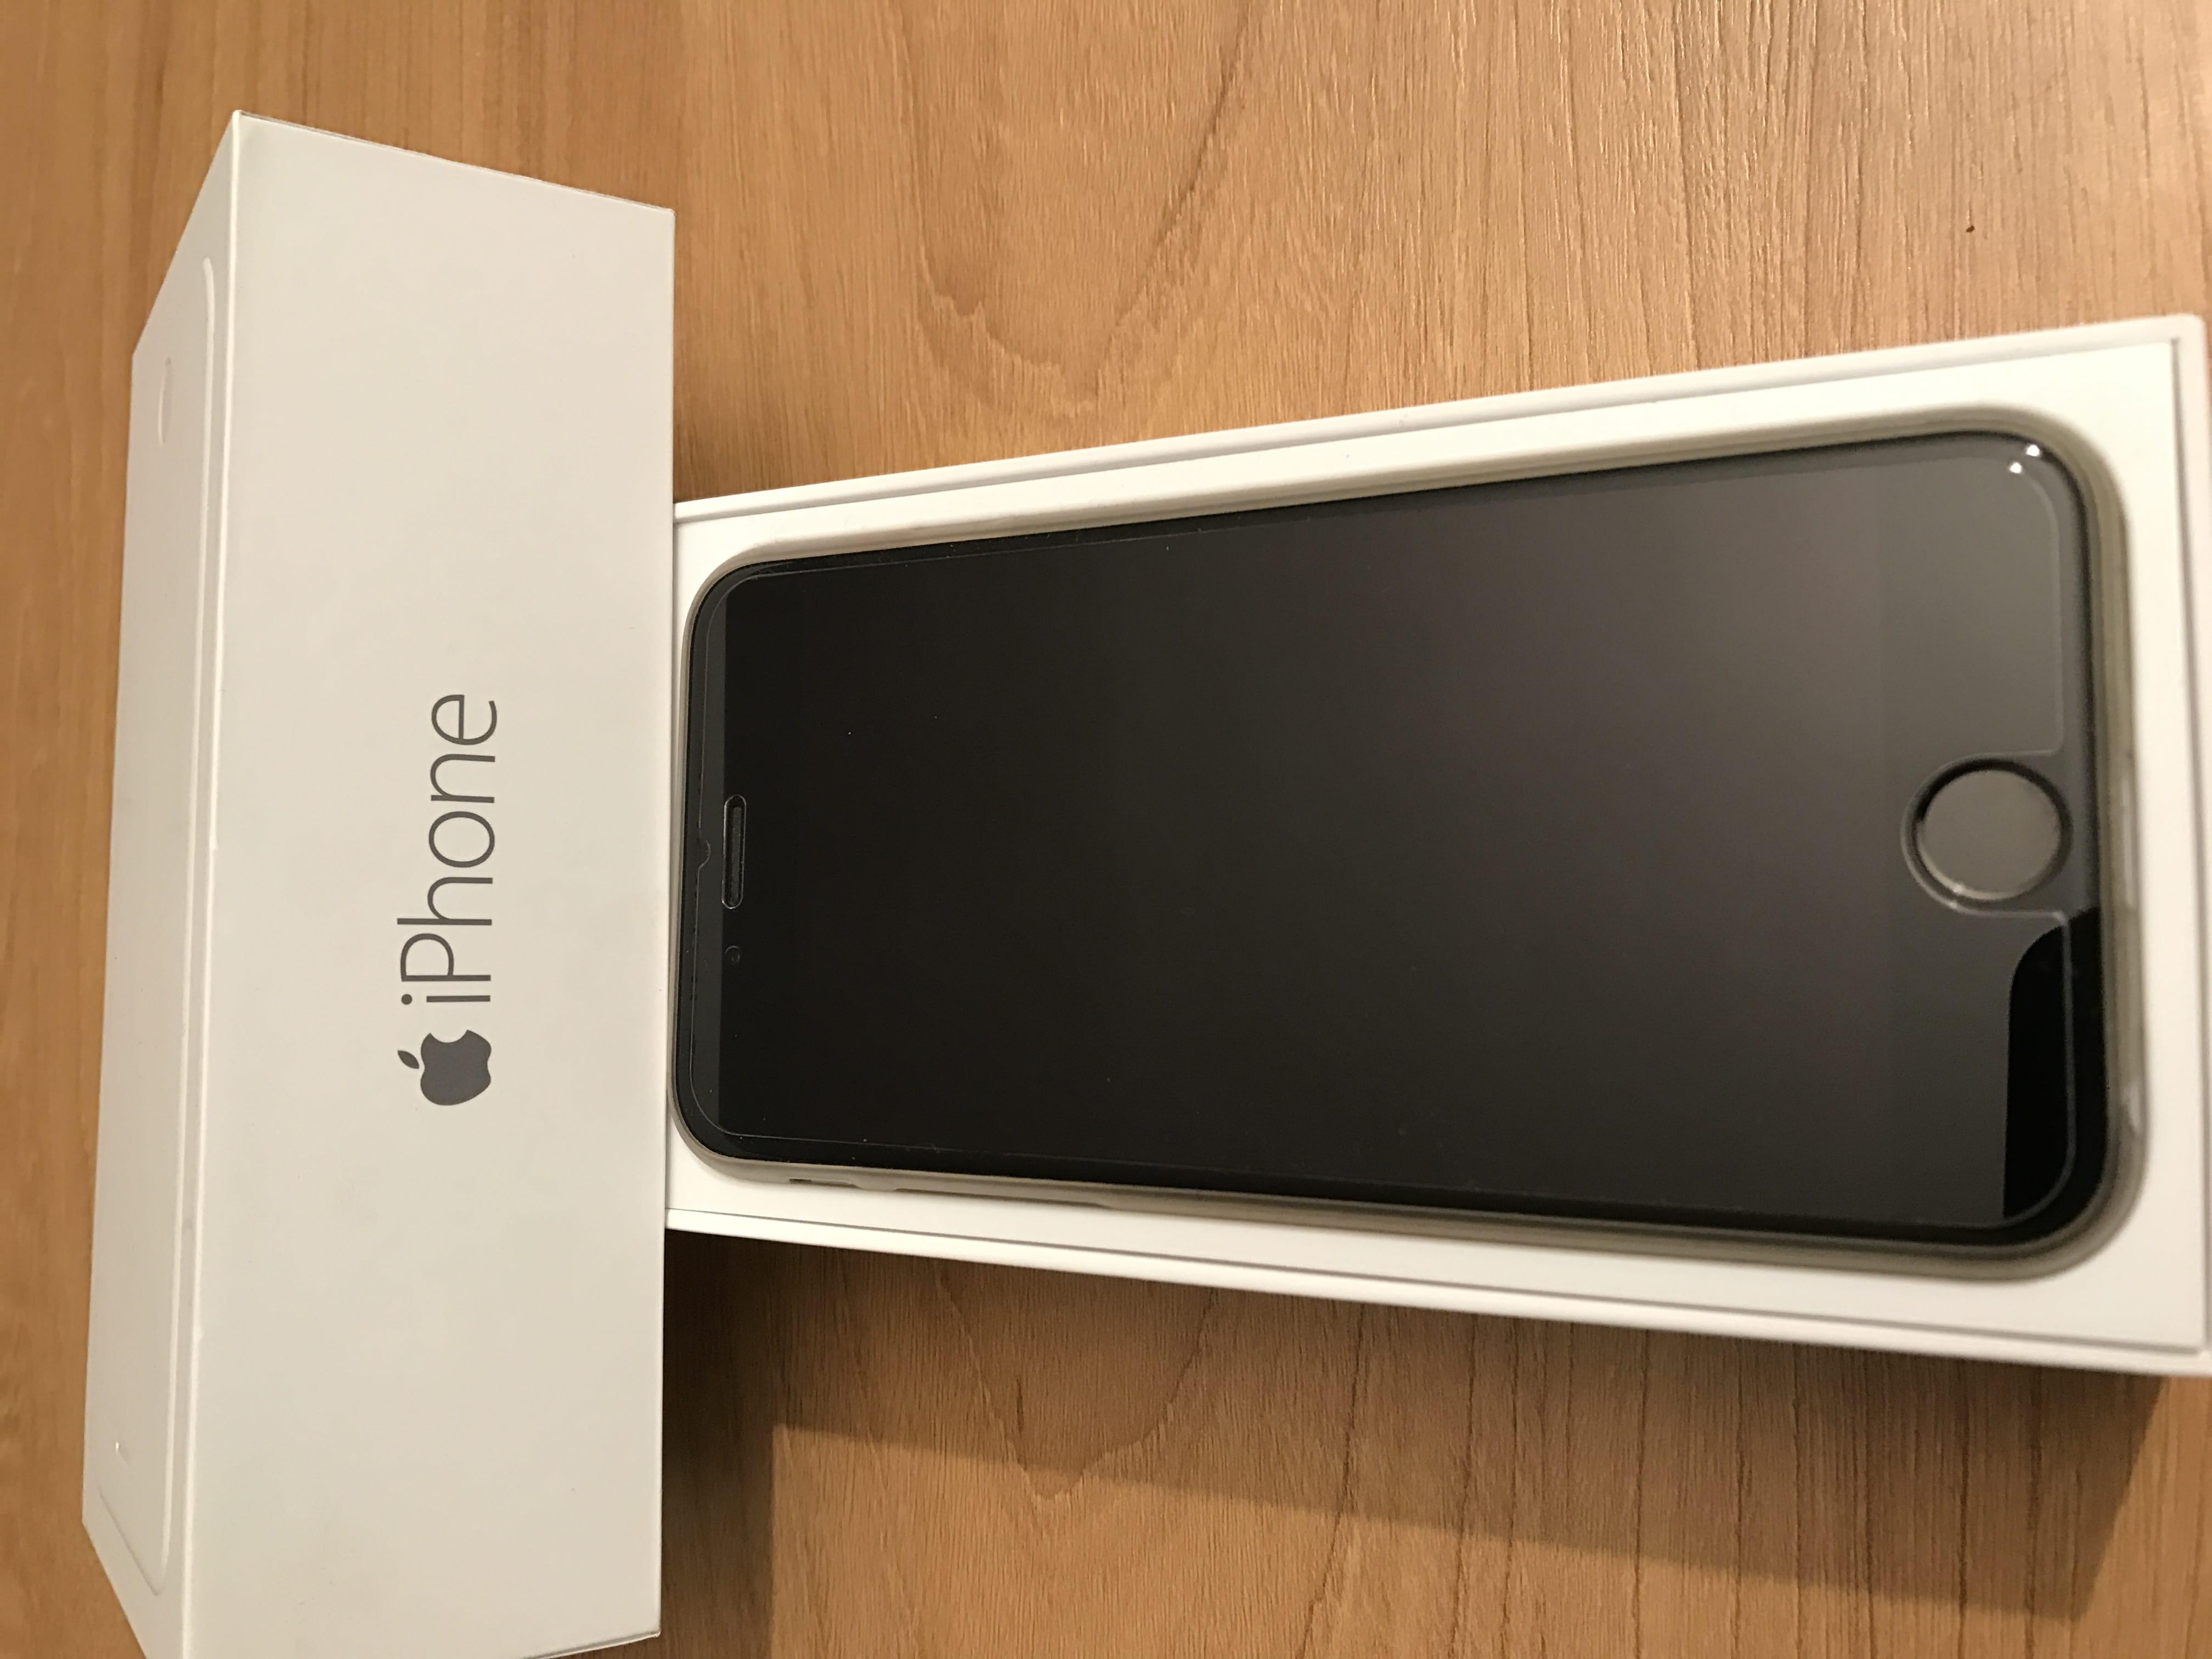 Zobraziť inzerát ~ MacBlog.sk - iPhone - iPhone 6 16GB 40465d0f21c